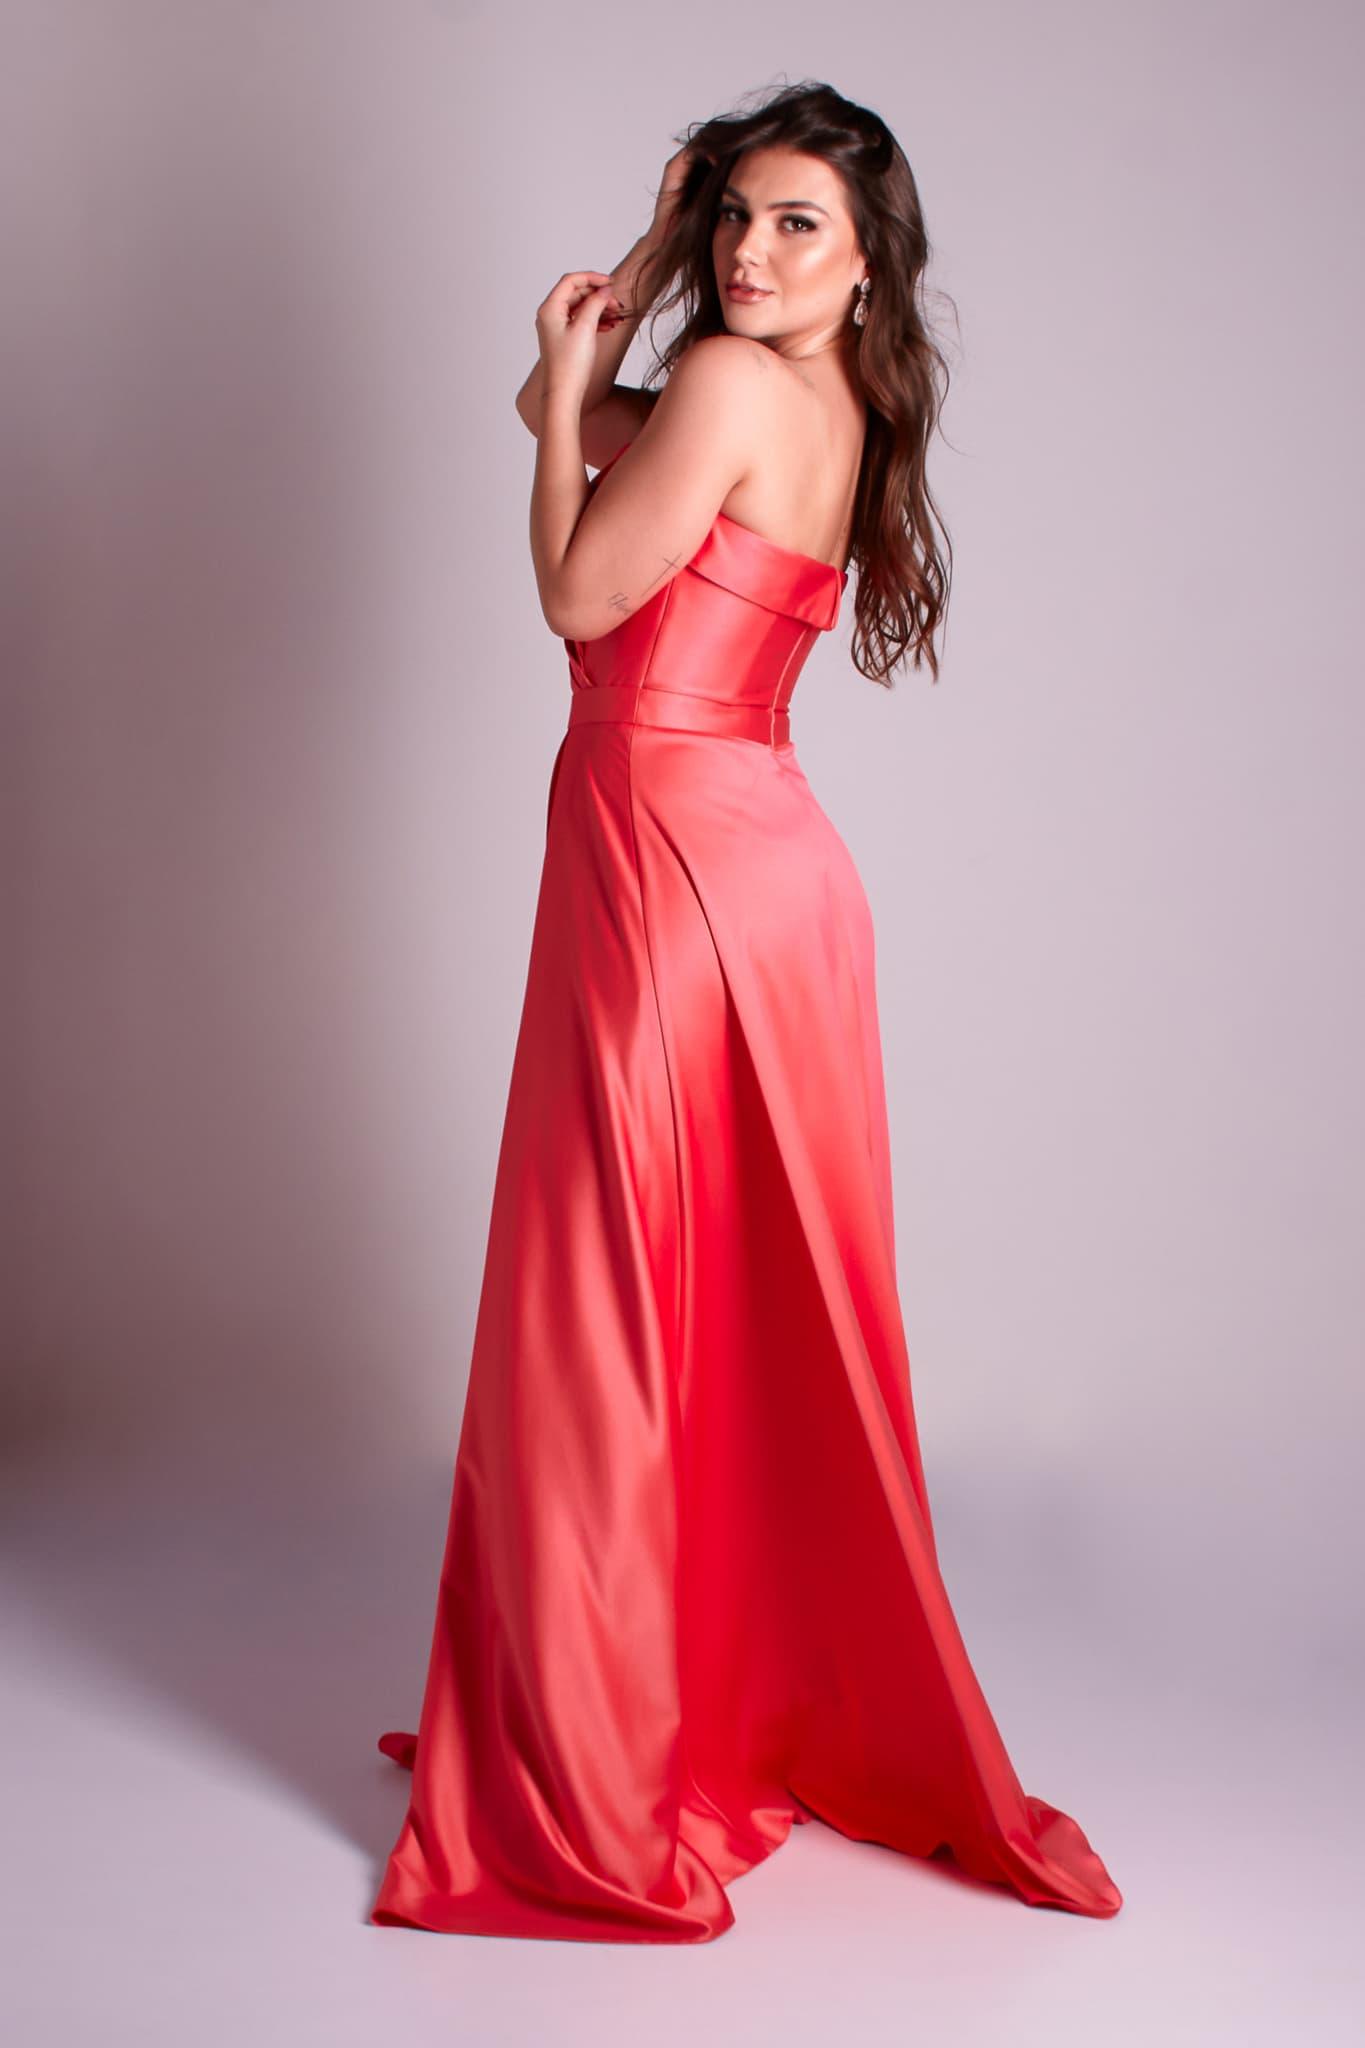 26 - vestido coral ou rosa chiclete de zibeline com fenda